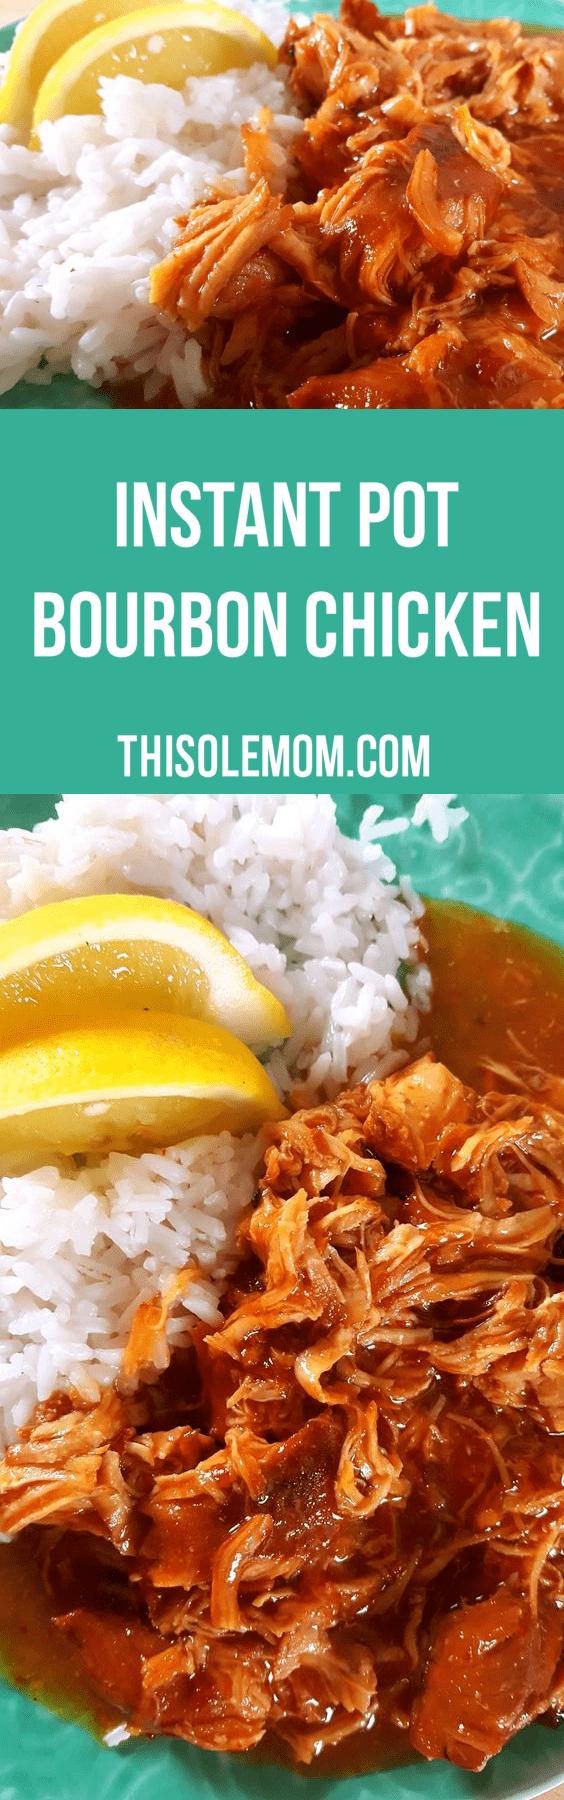 Instant Pot Bourbon Chicken Recipe